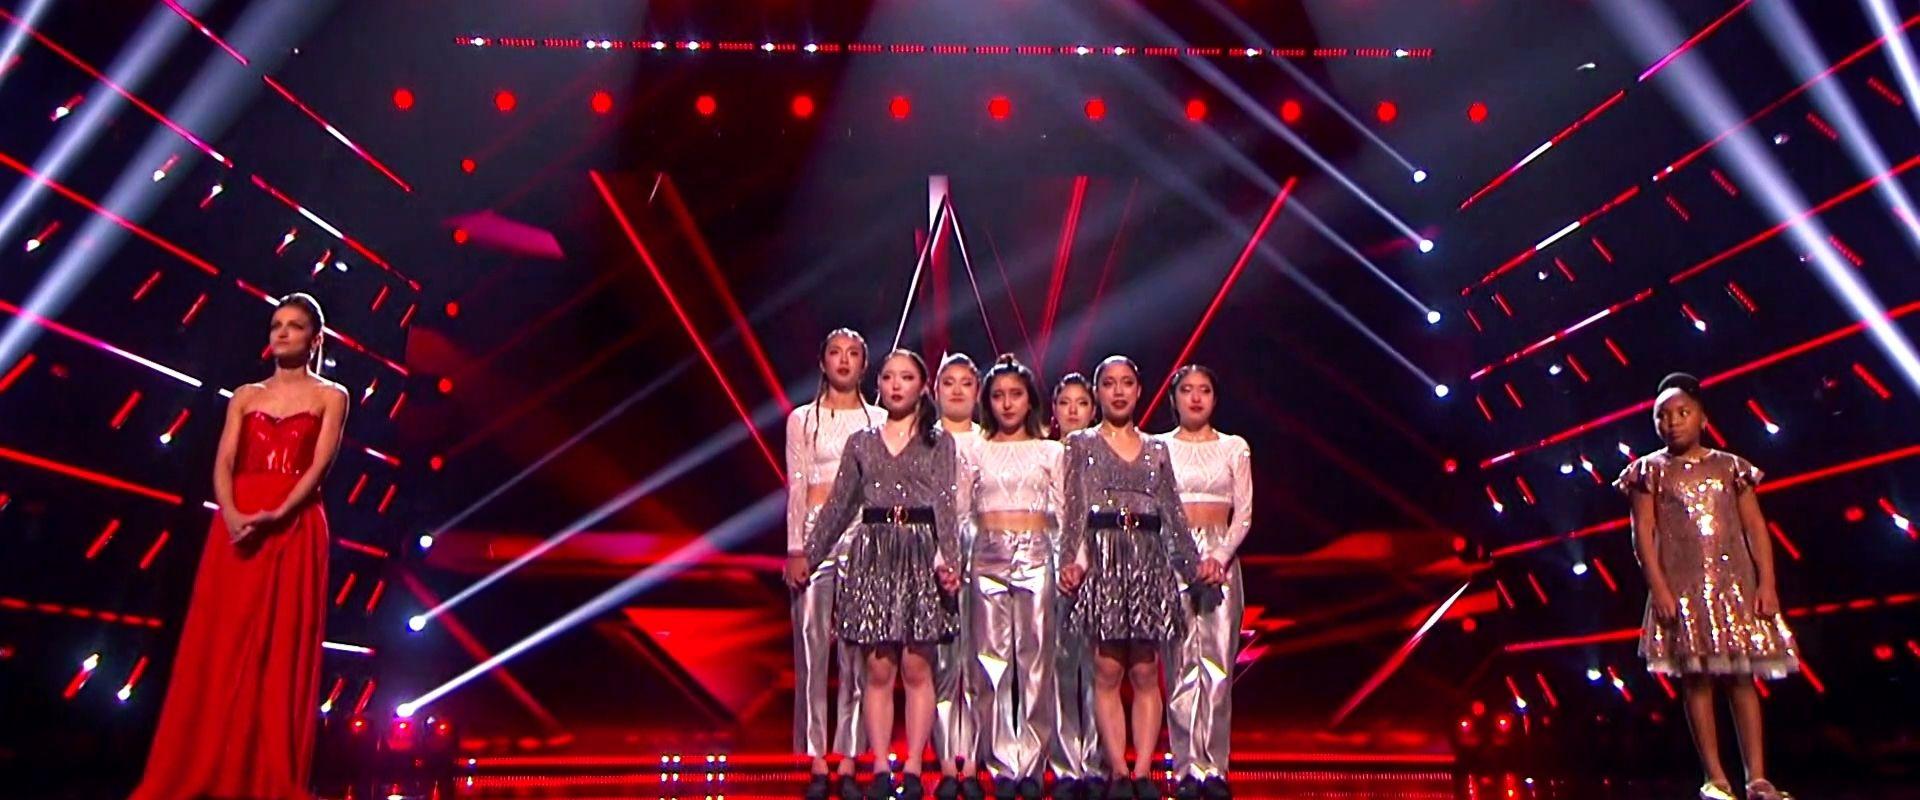 America's Got Talent Season 16 Episode 19